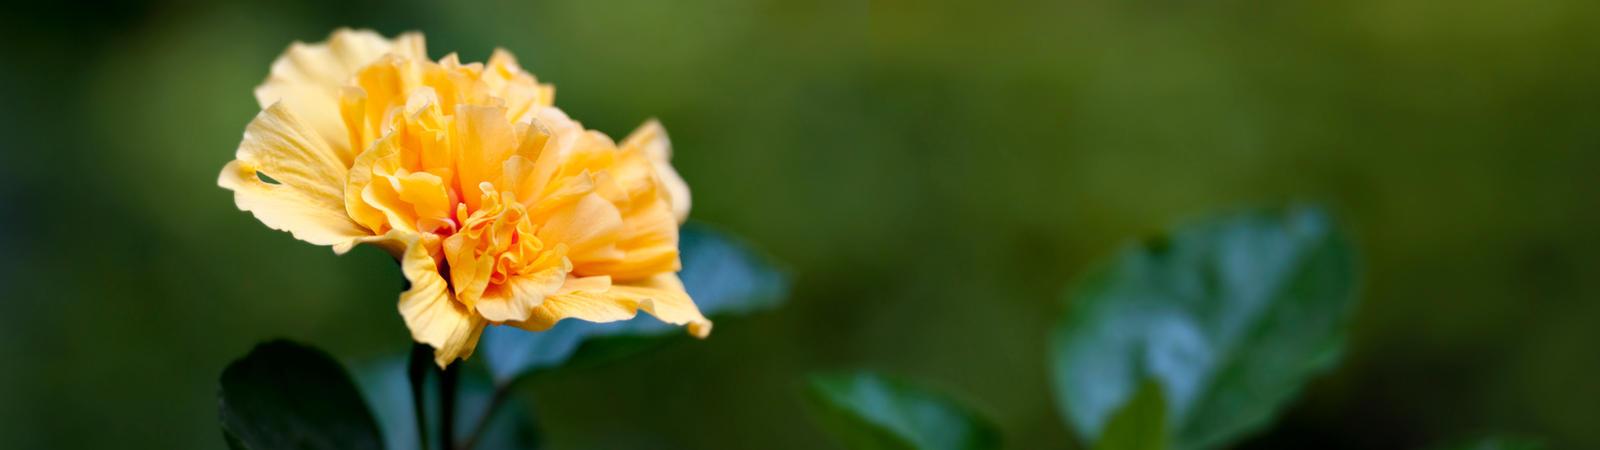 Yellow Flower by Bathlamos